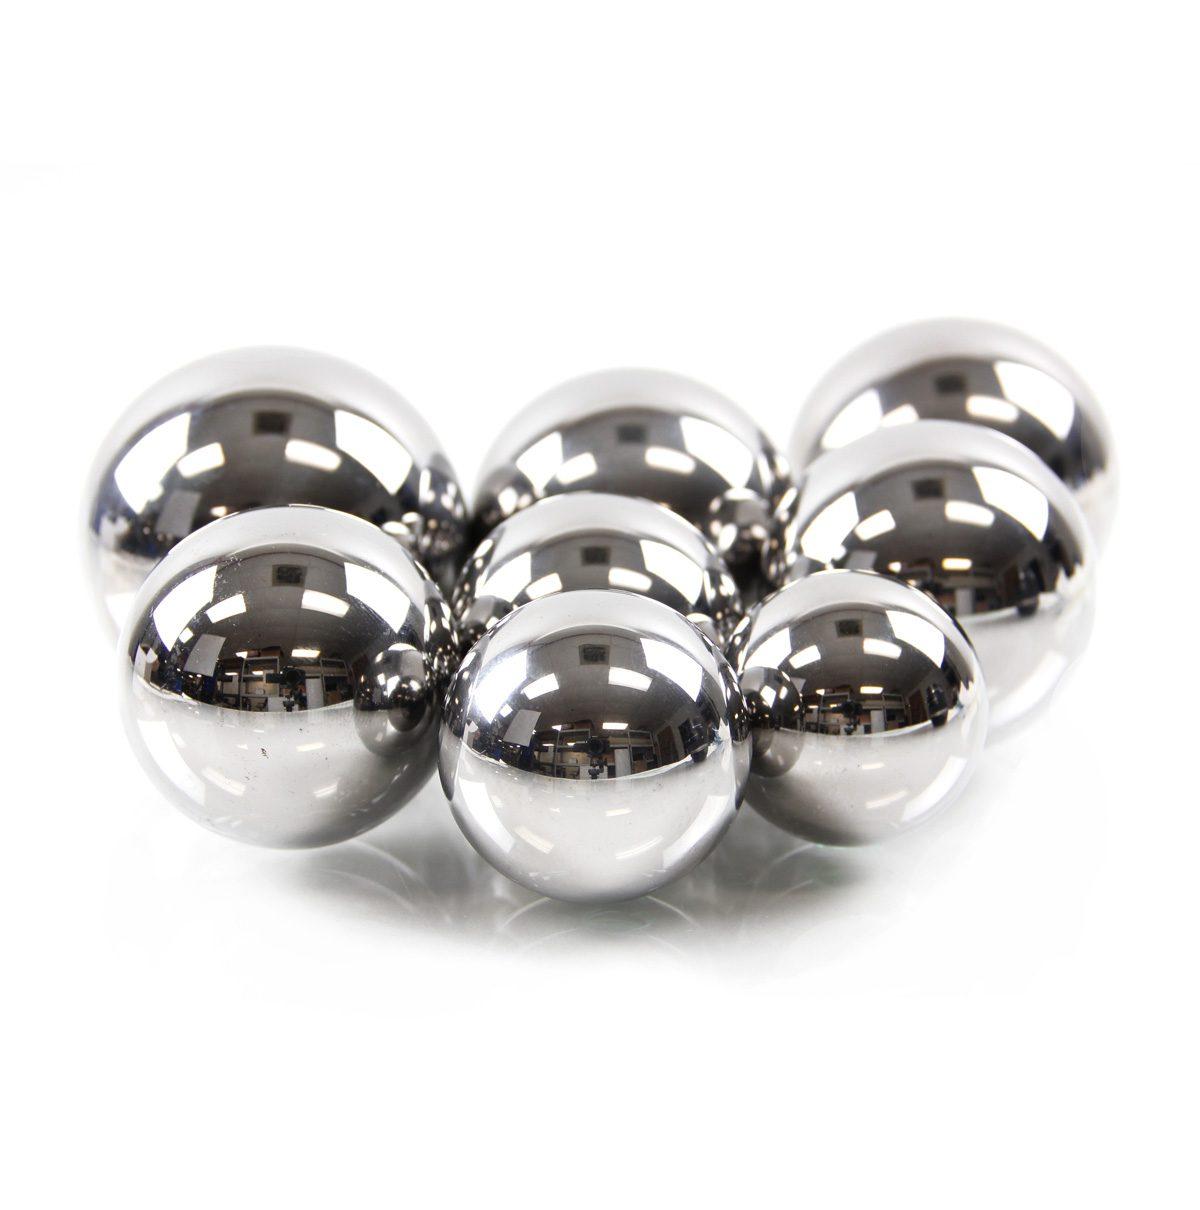 mdrs ball set b 8 solid chrome steel wcase 3